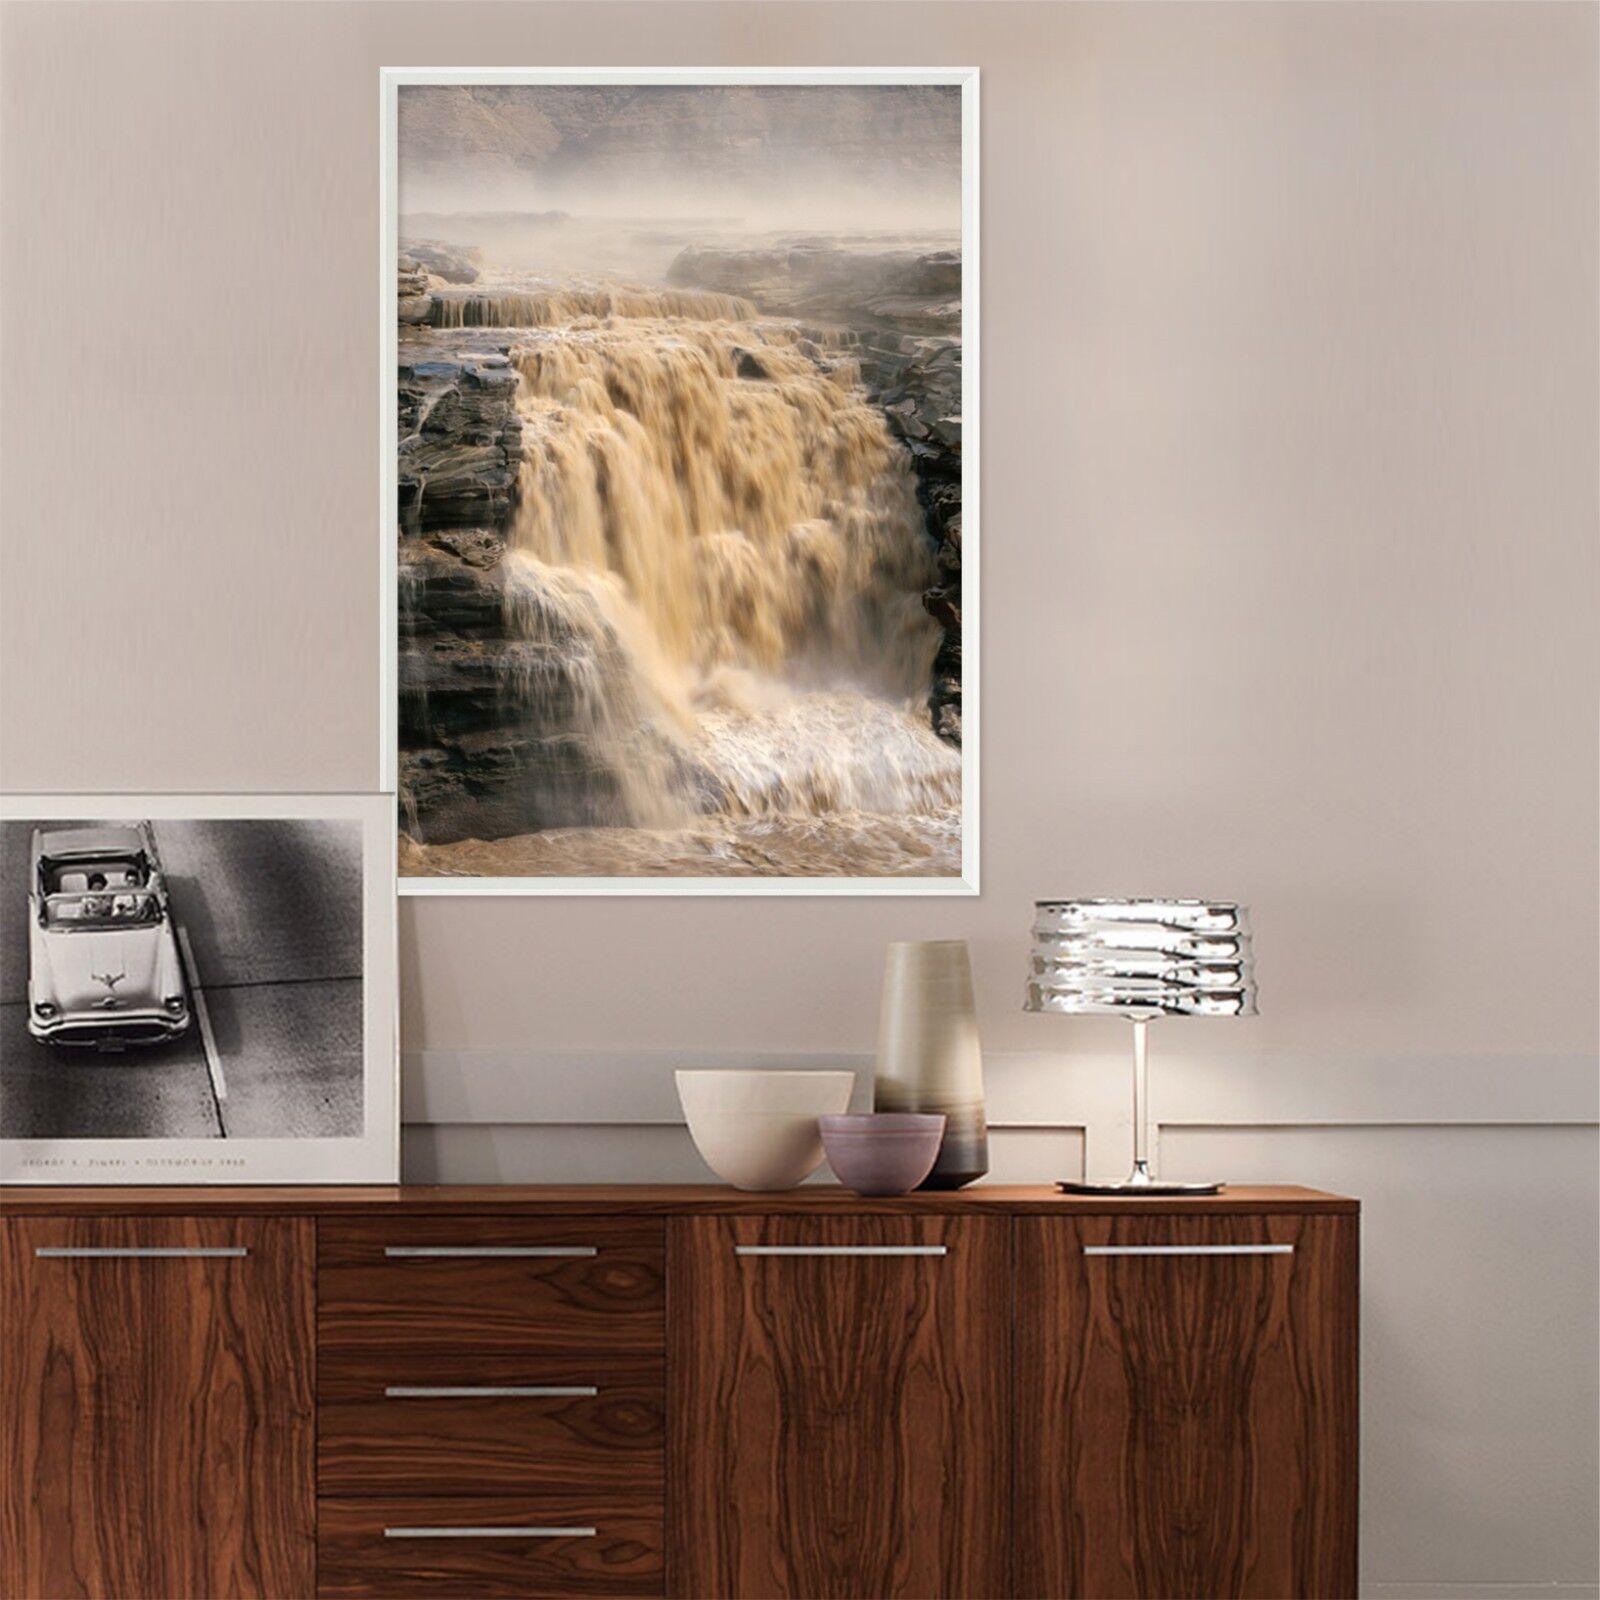 3D Gelber Fluss Wasserfall 51 Gerahmt Poster Daheim Dekor Drucken Malerei Kunst